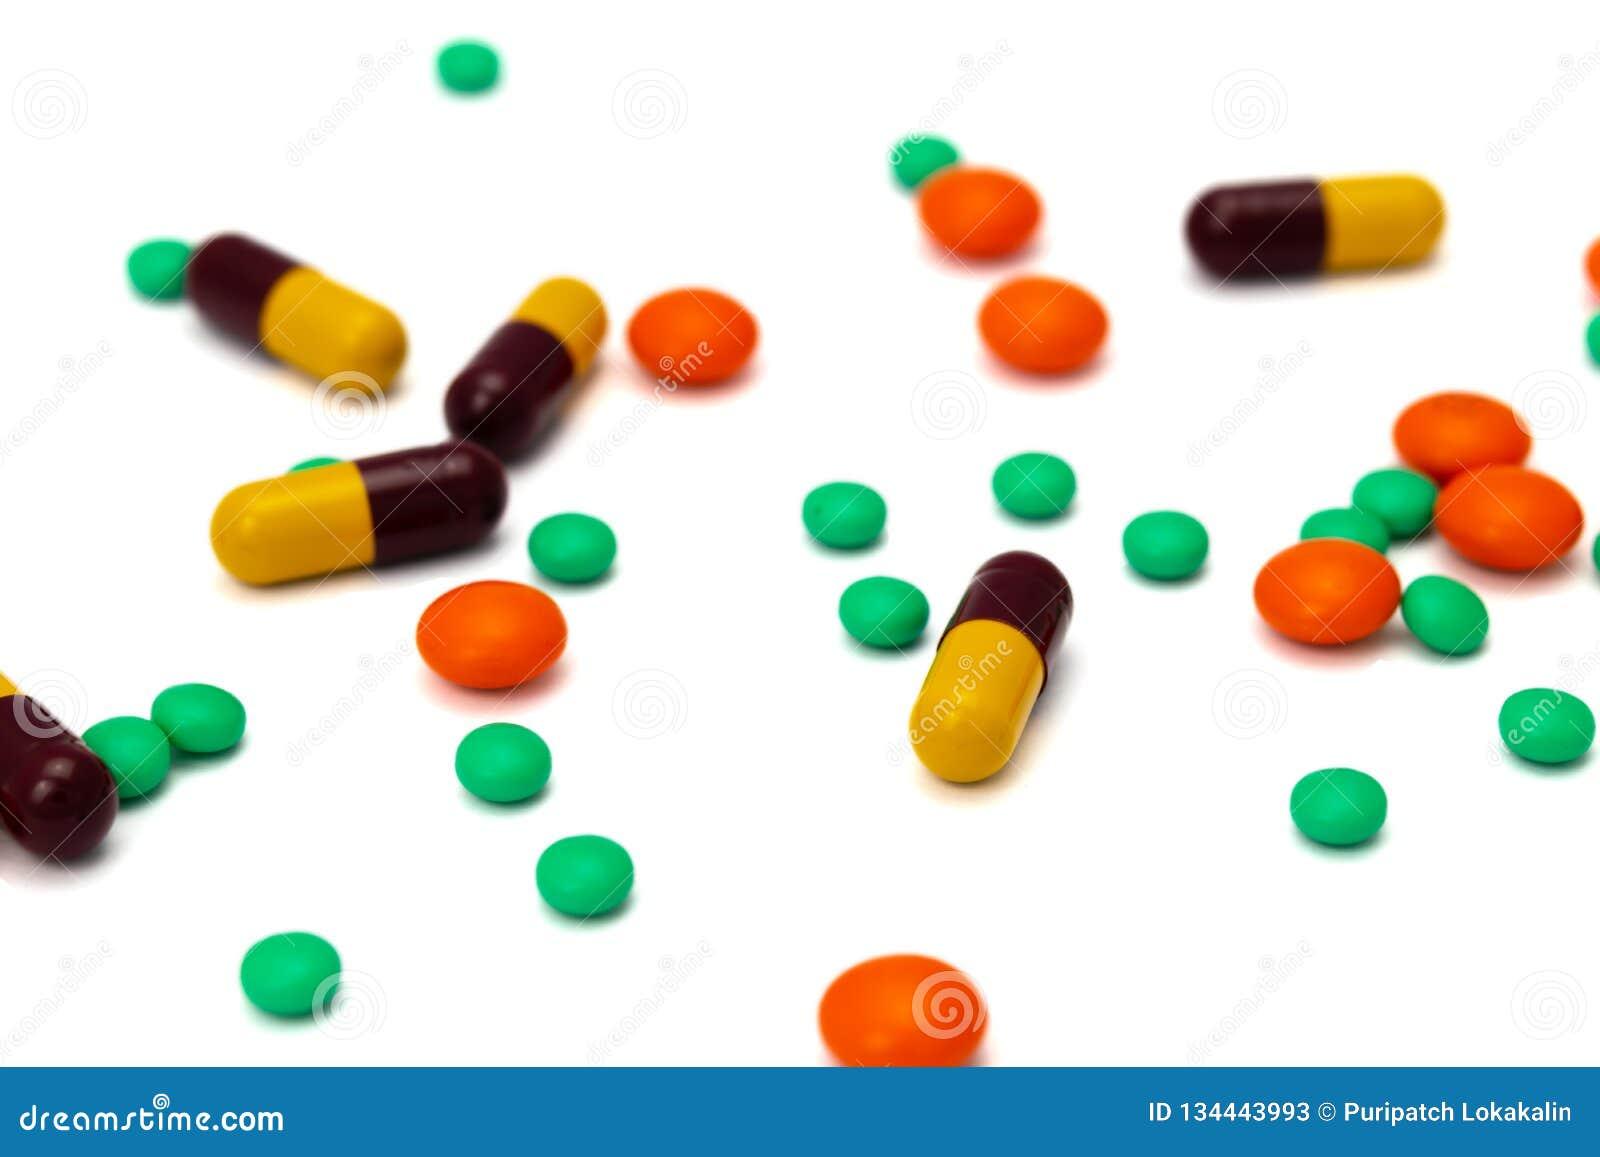 Píldoras y cápsulas